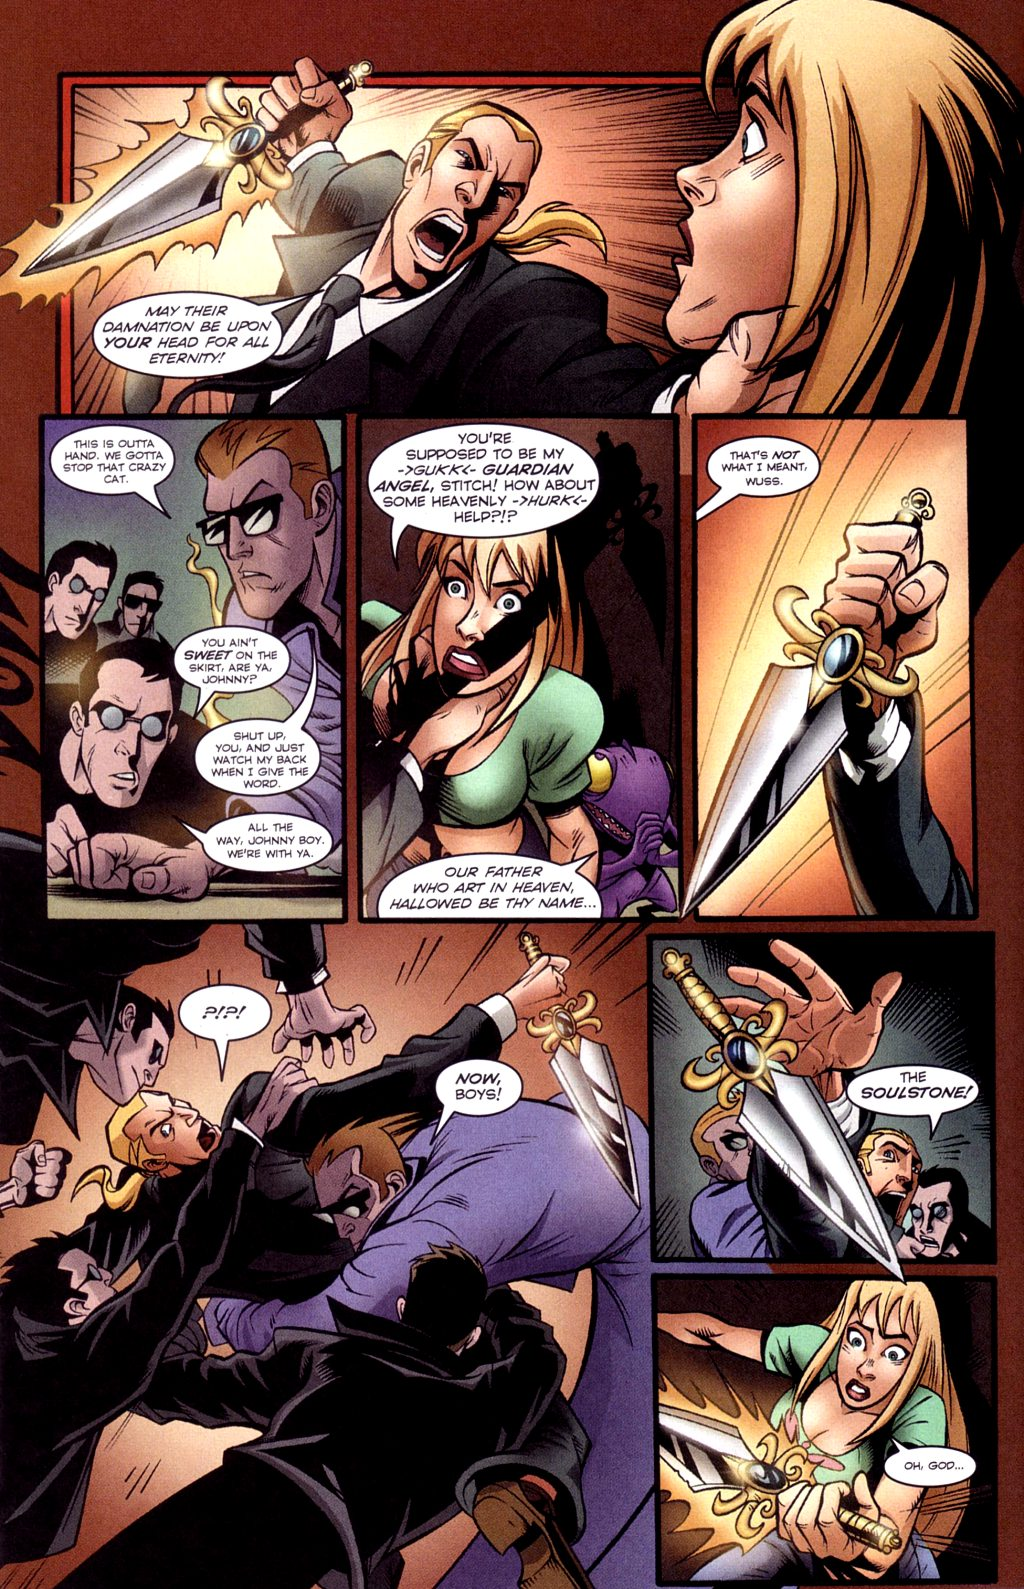 Read online Jezebelle comic -  Issue #3 - 7